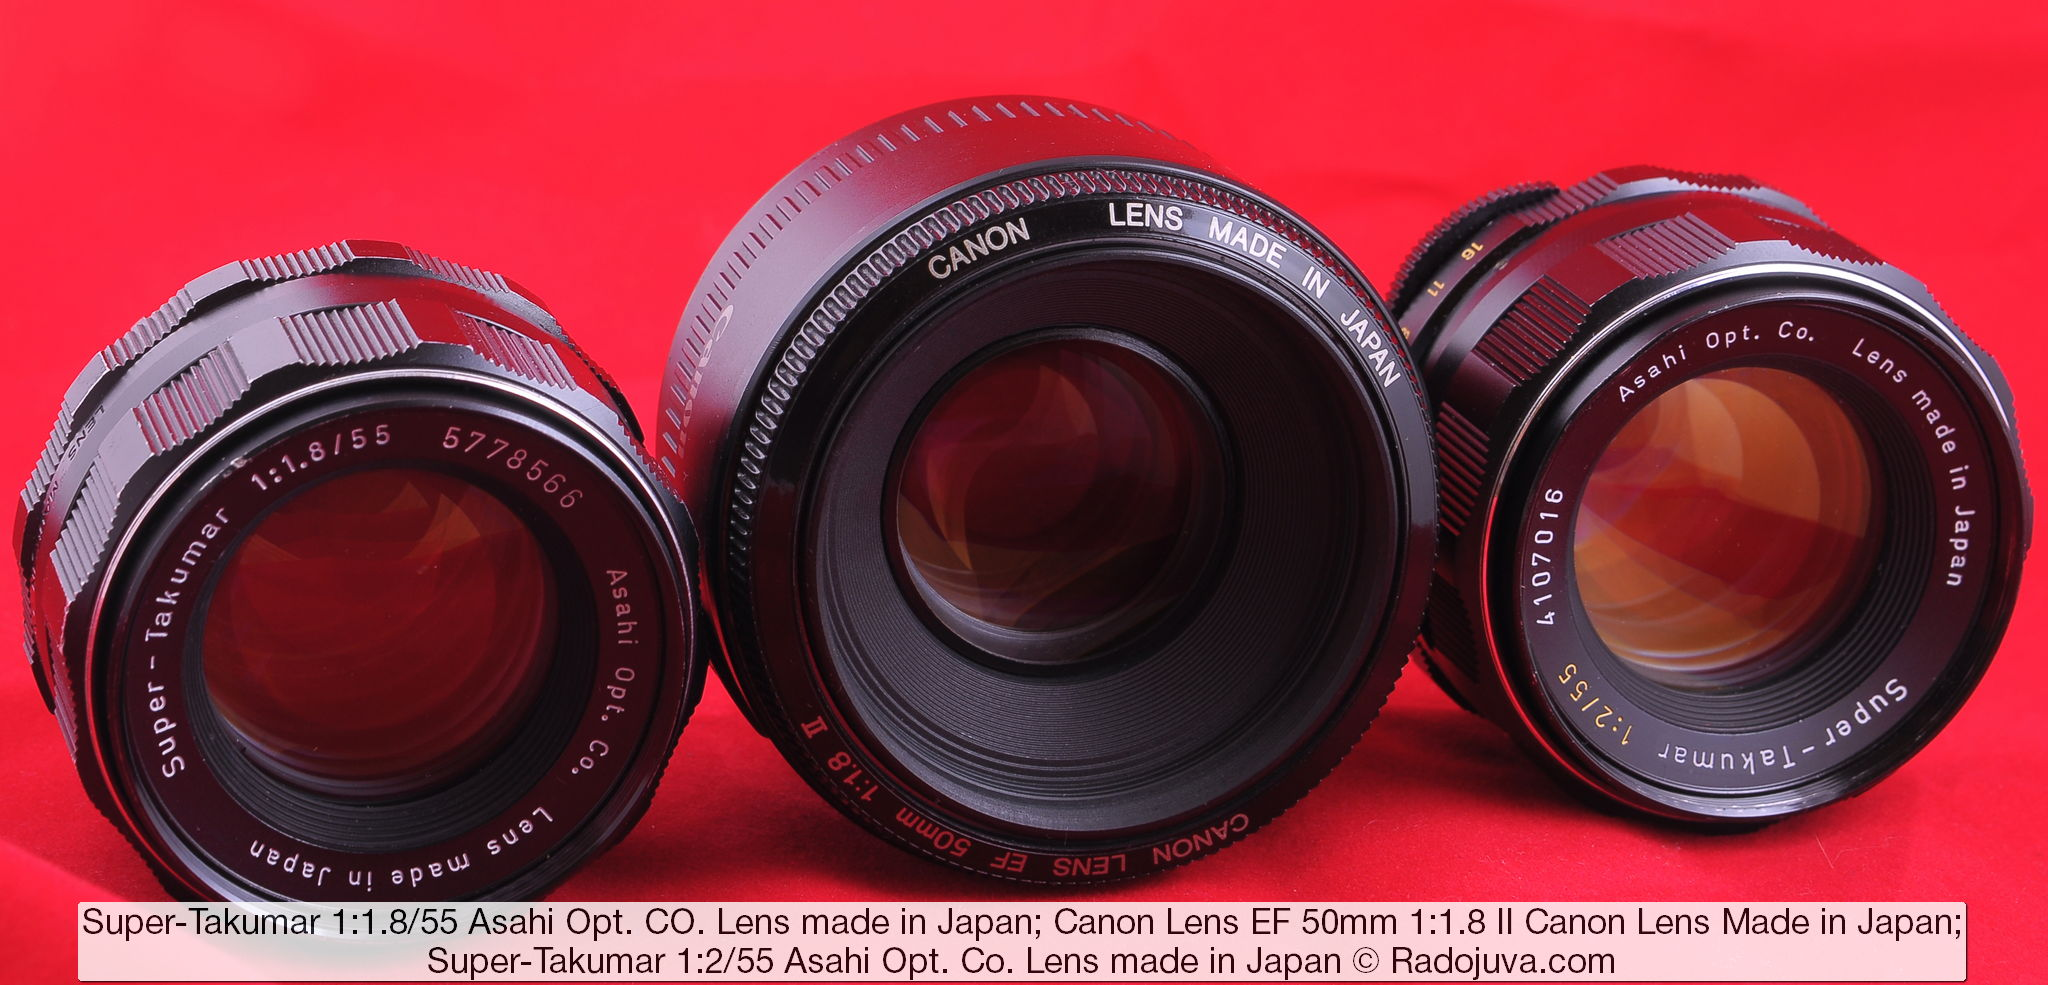 Объективы Super-Takumar 1:1.8/55 Asahi Opt. Co. Lens made in Japan и Canon Lens EF 50mm 1:1.8 II Canon Lens Made in Japan и Super-Takumar 1:2/55 Asahi Opt. Co. Lens made in Japan